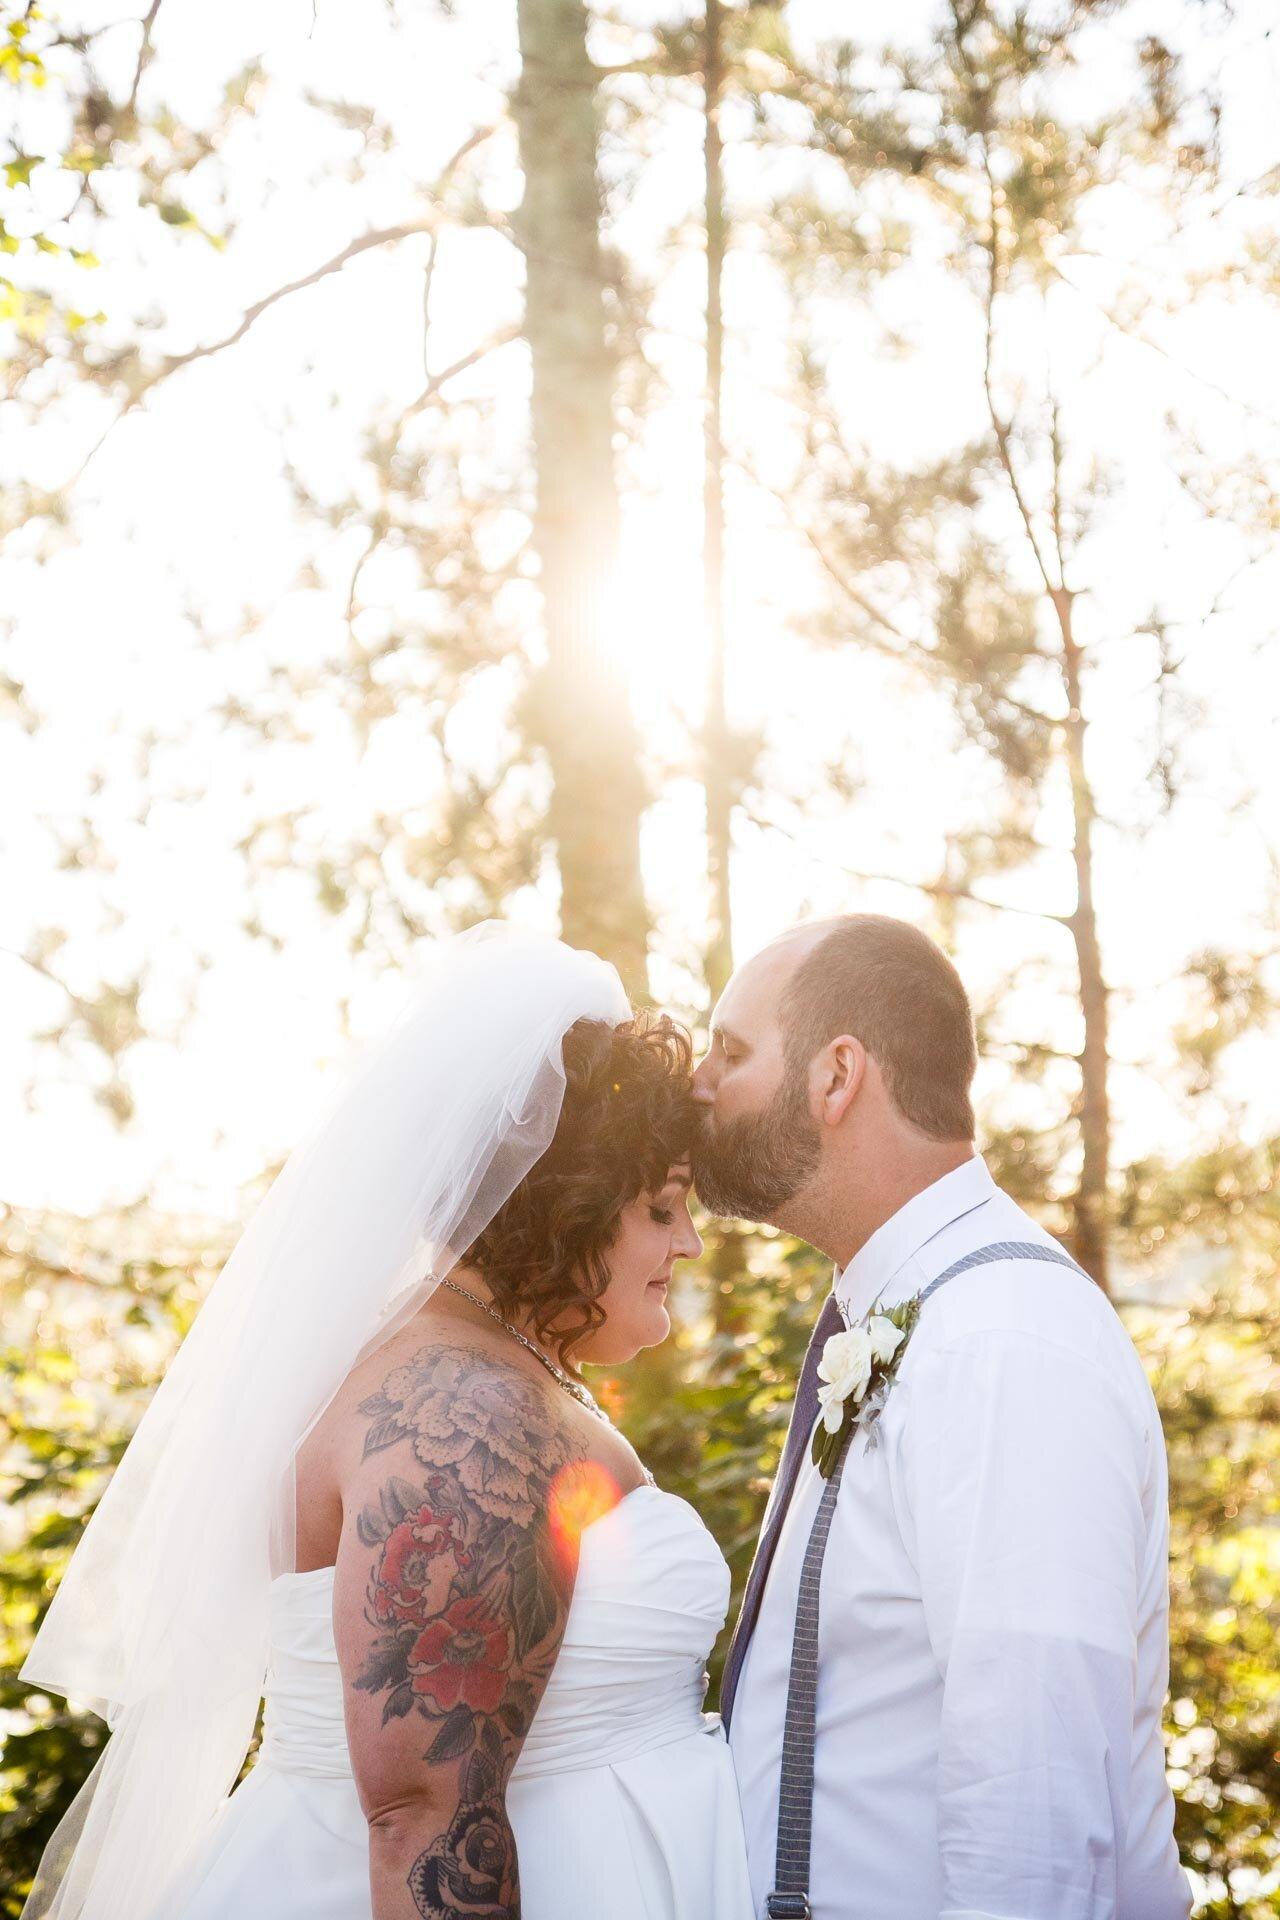 fall-lighting-adam-shea-photography-wedding-engagement-blog-adam-shea-photography-green-bay-appleton-neenah-photographer-07.jpg